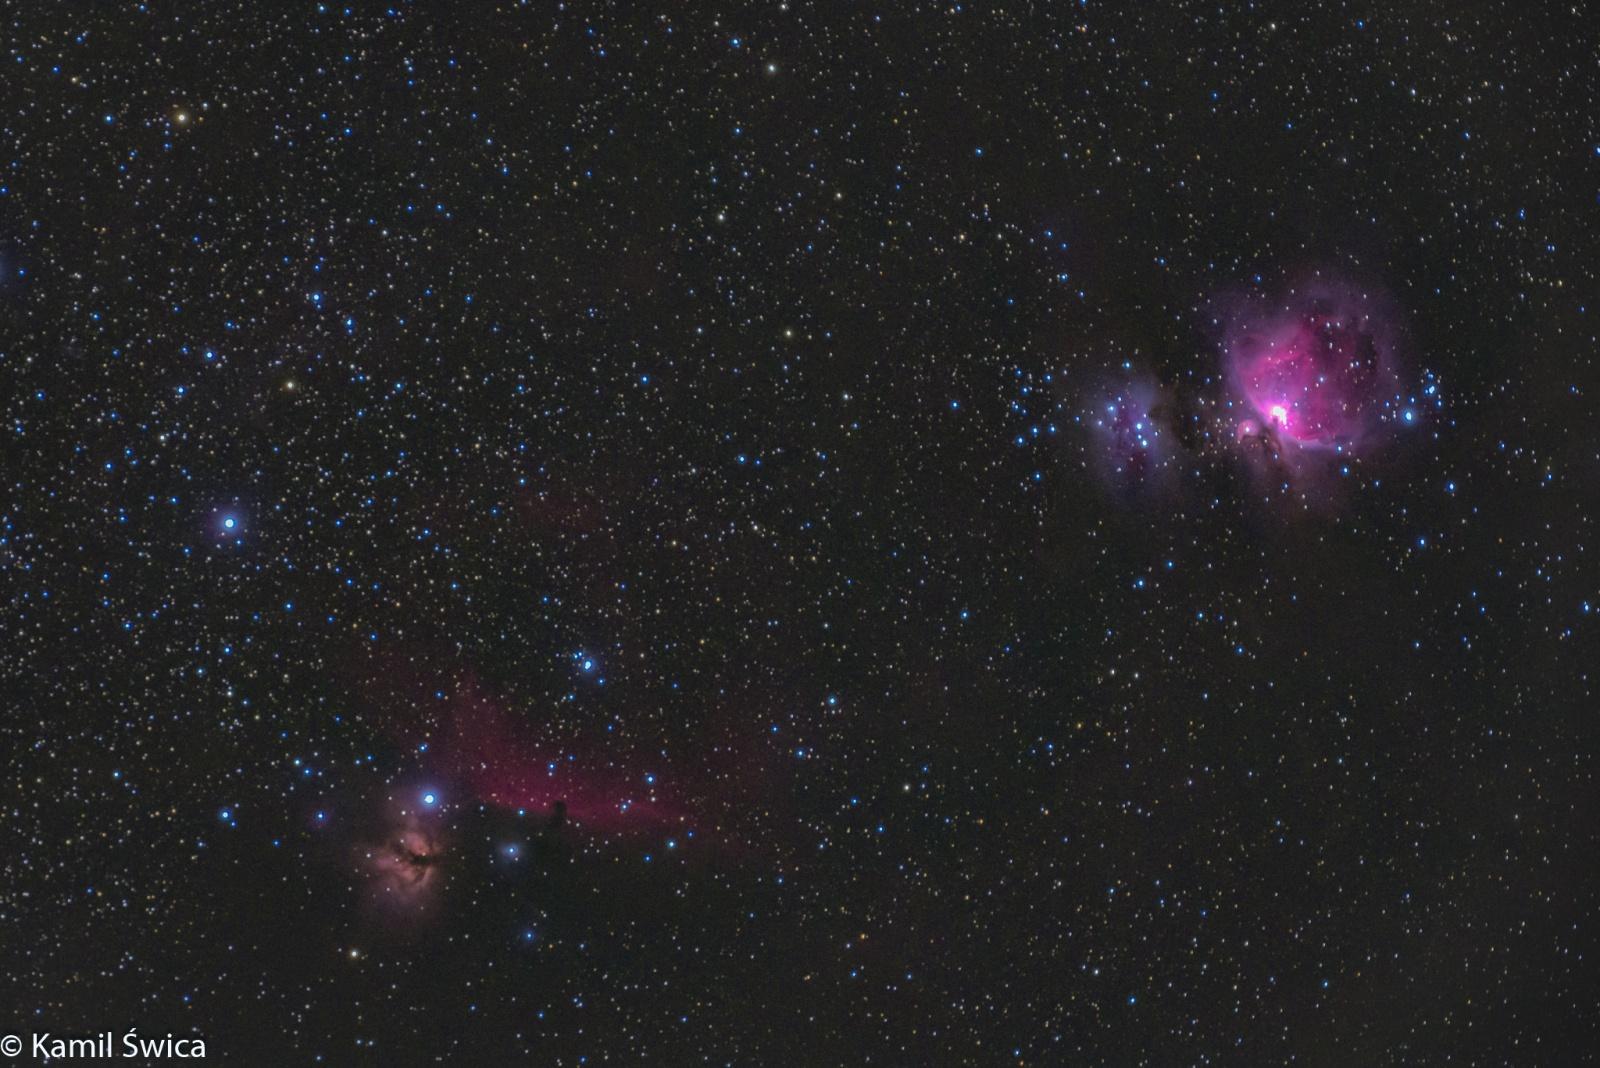 _rodek_Oriona_SpaceCat_11_01_2021_Sequator1_ABE.jpg